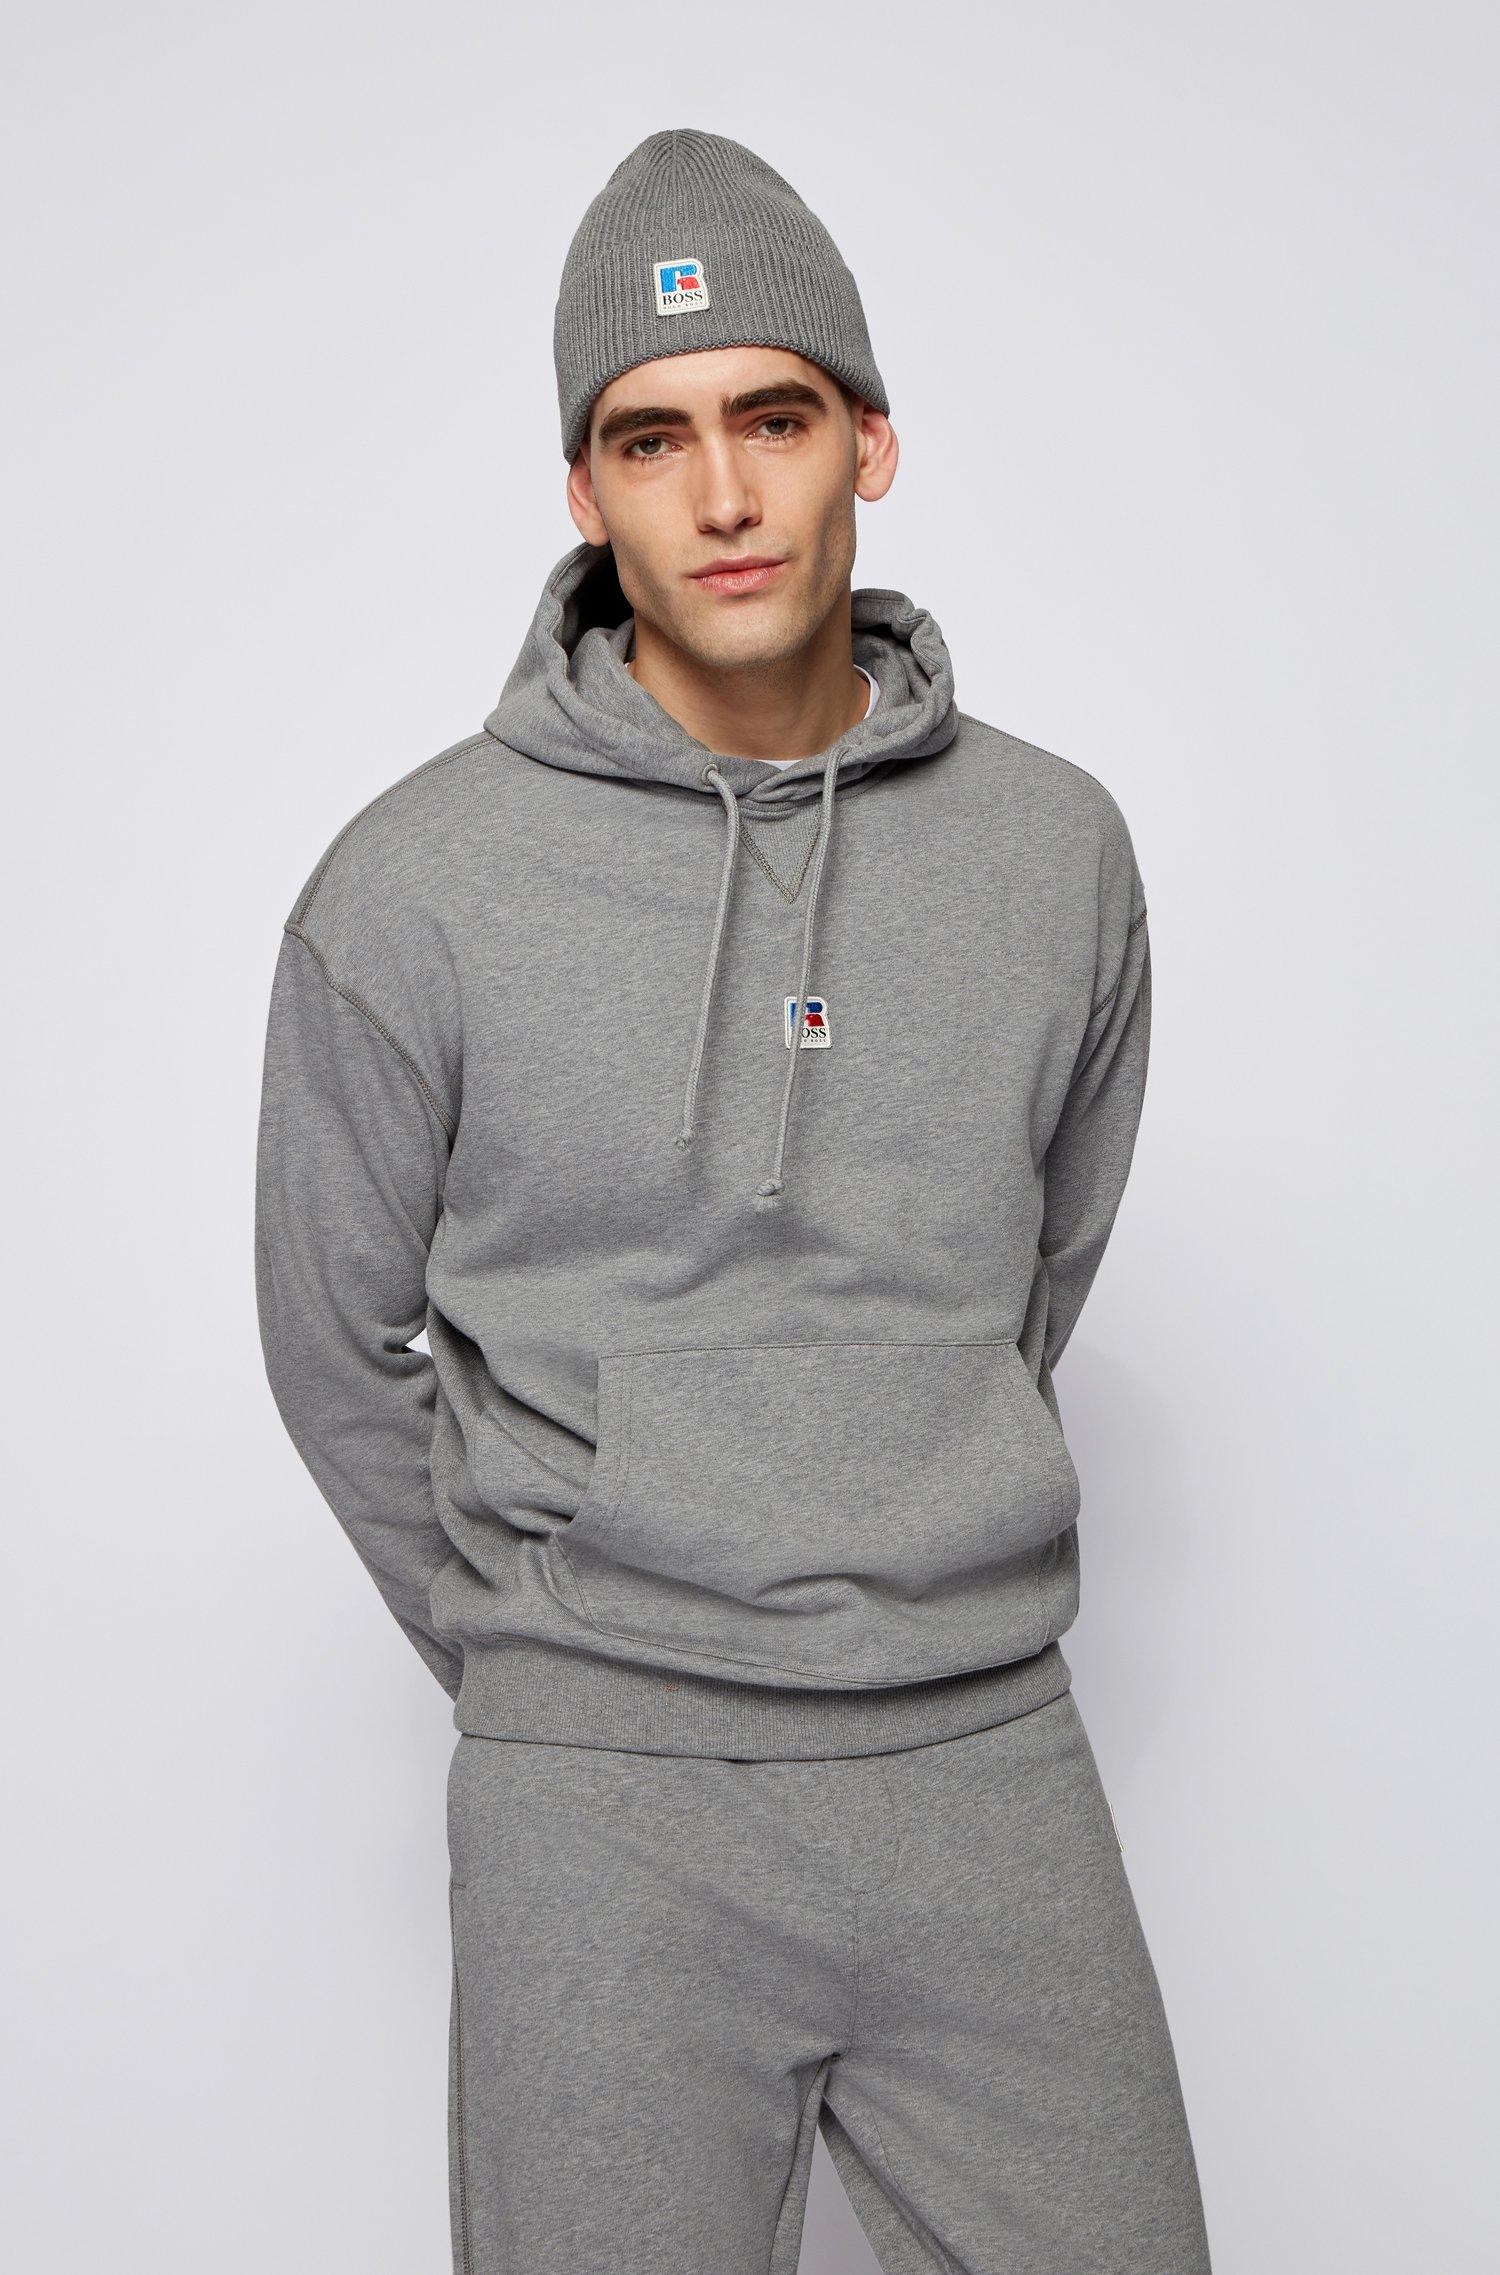 Sudadera con capucha unisex relaxed fit en algodón orgánico con logo exclusivo, Gris